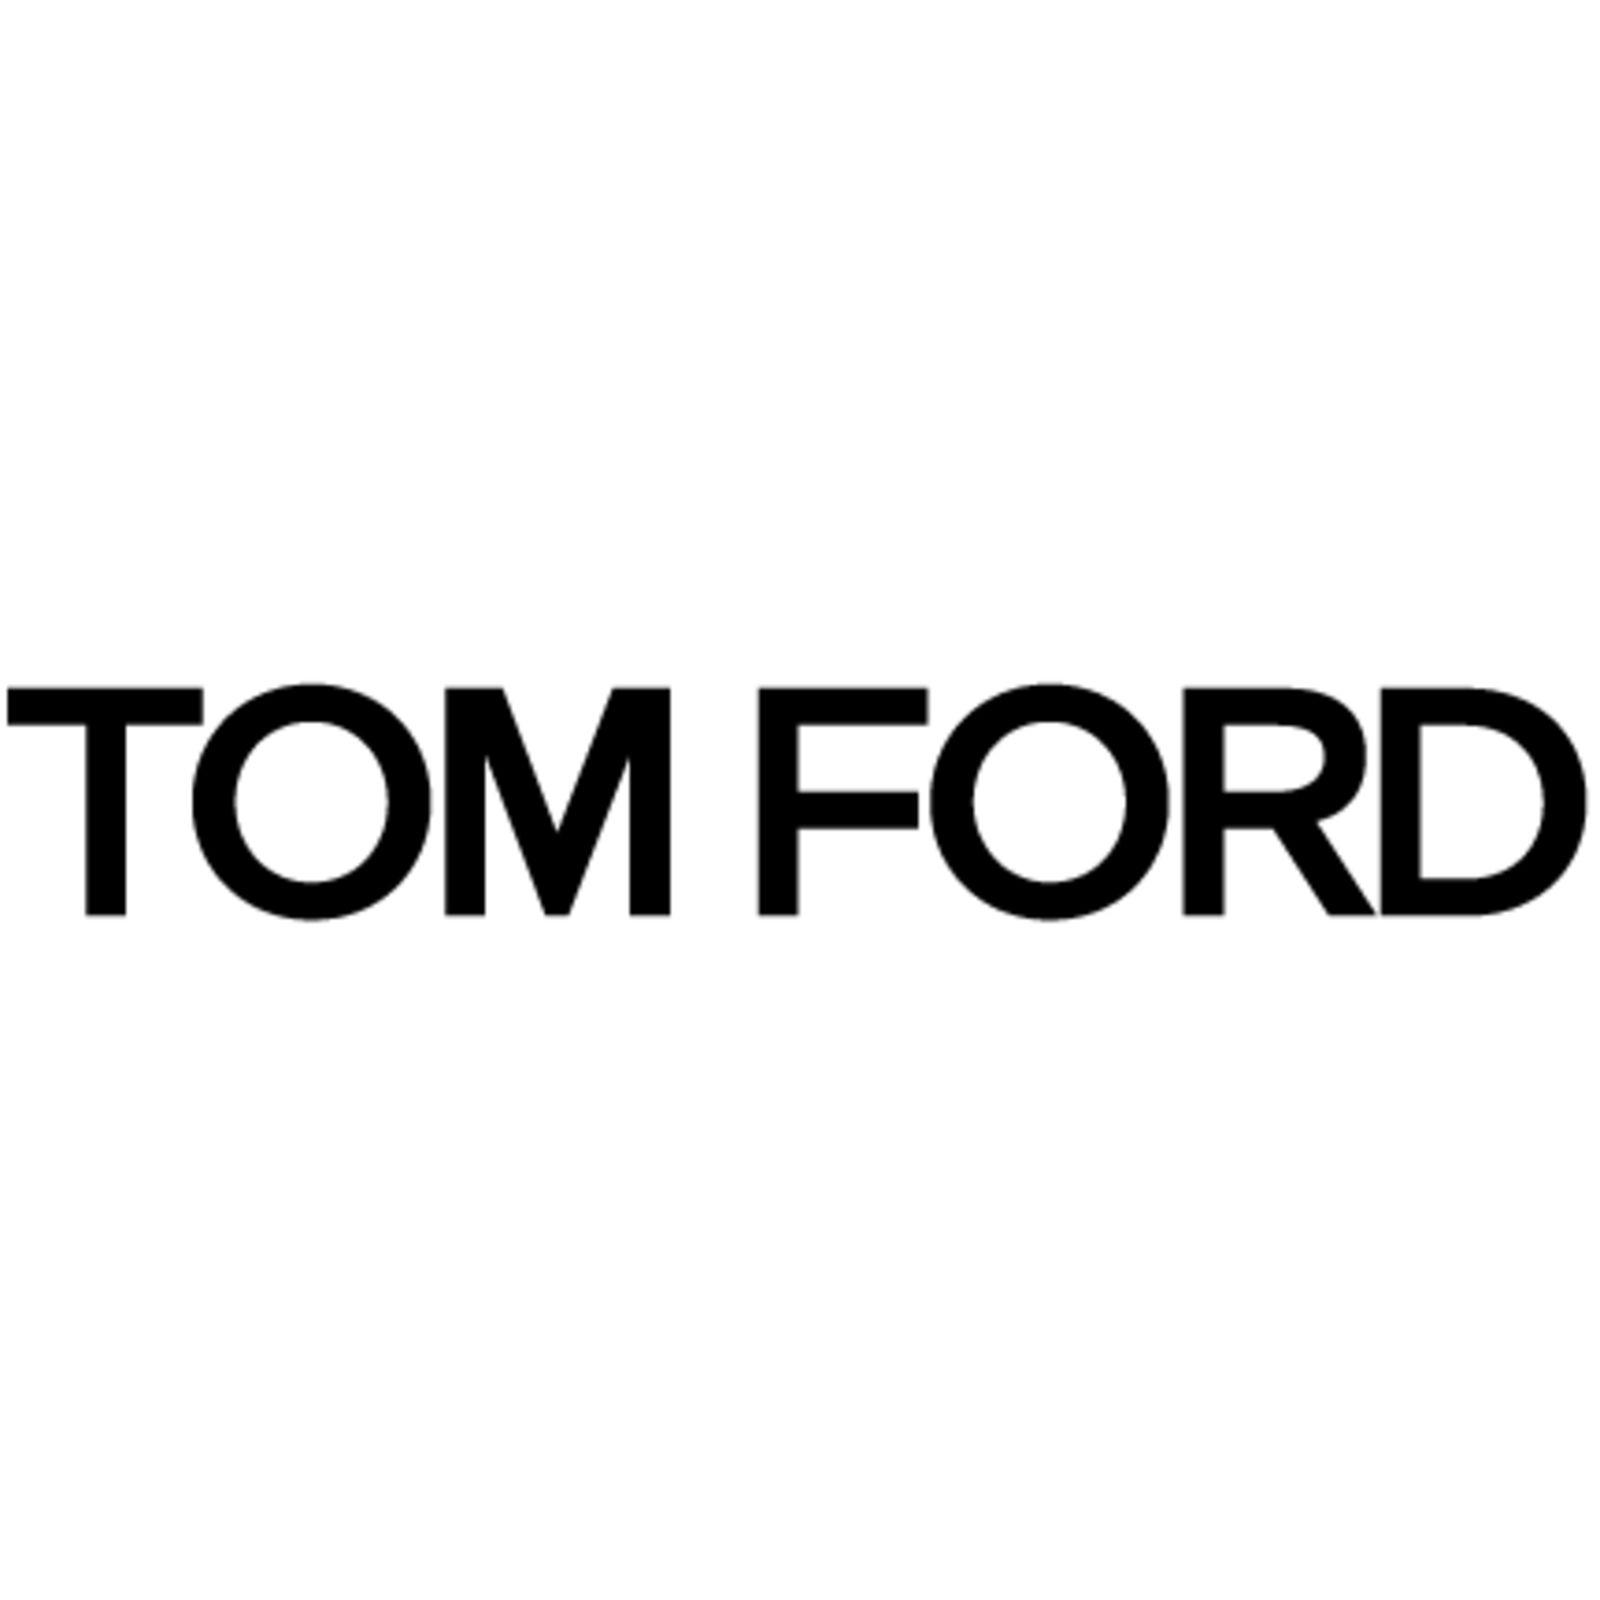 TOM FORD (Image 1)